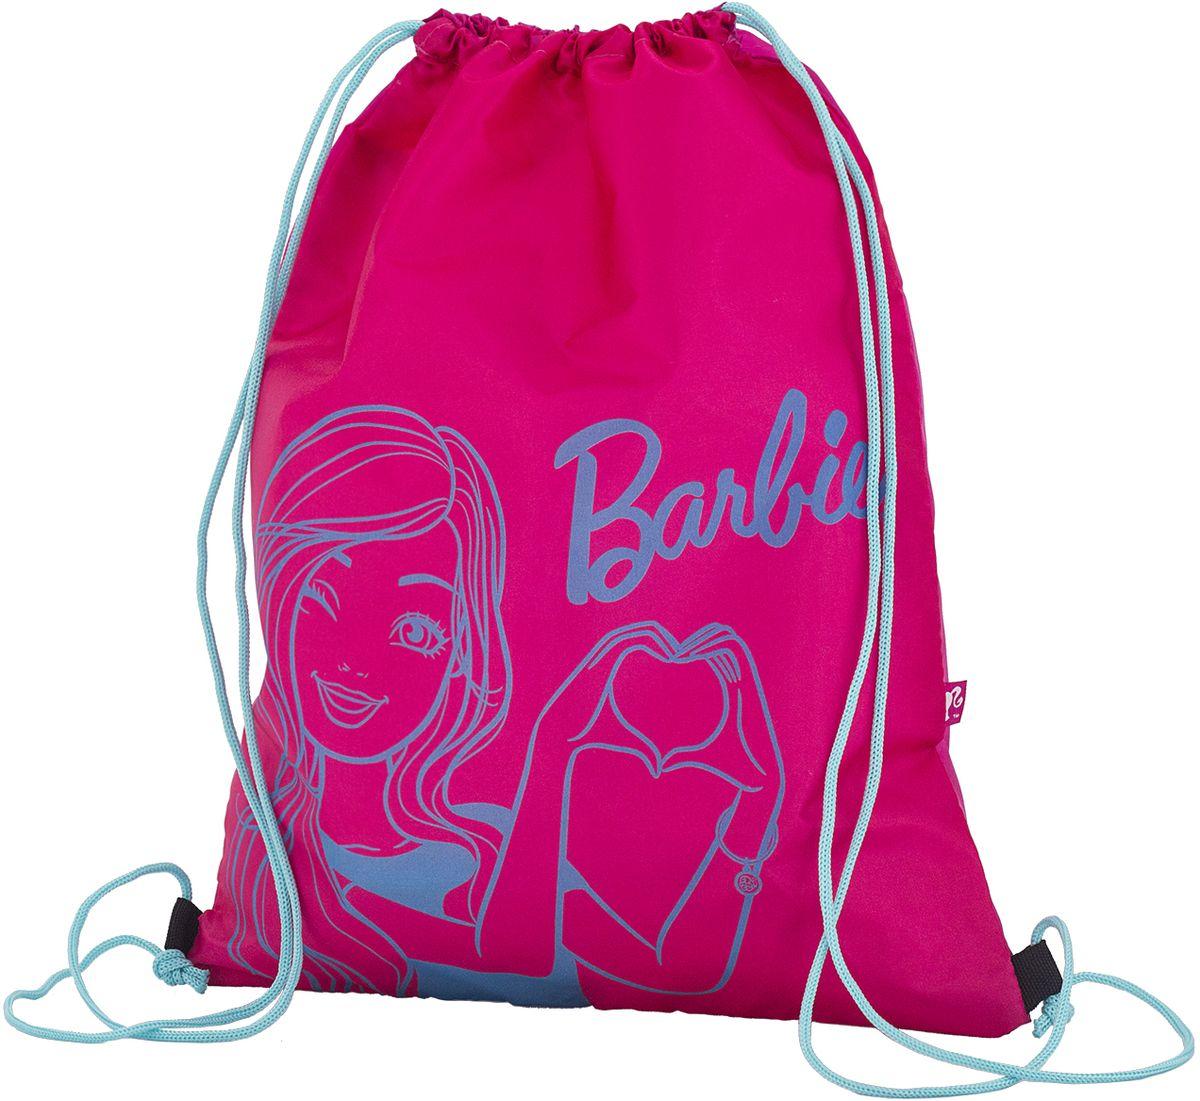 Barbie Сумка для сменной обуви BREB-MT2-883 сумка kinderline international mhbz us1 51box5 v3